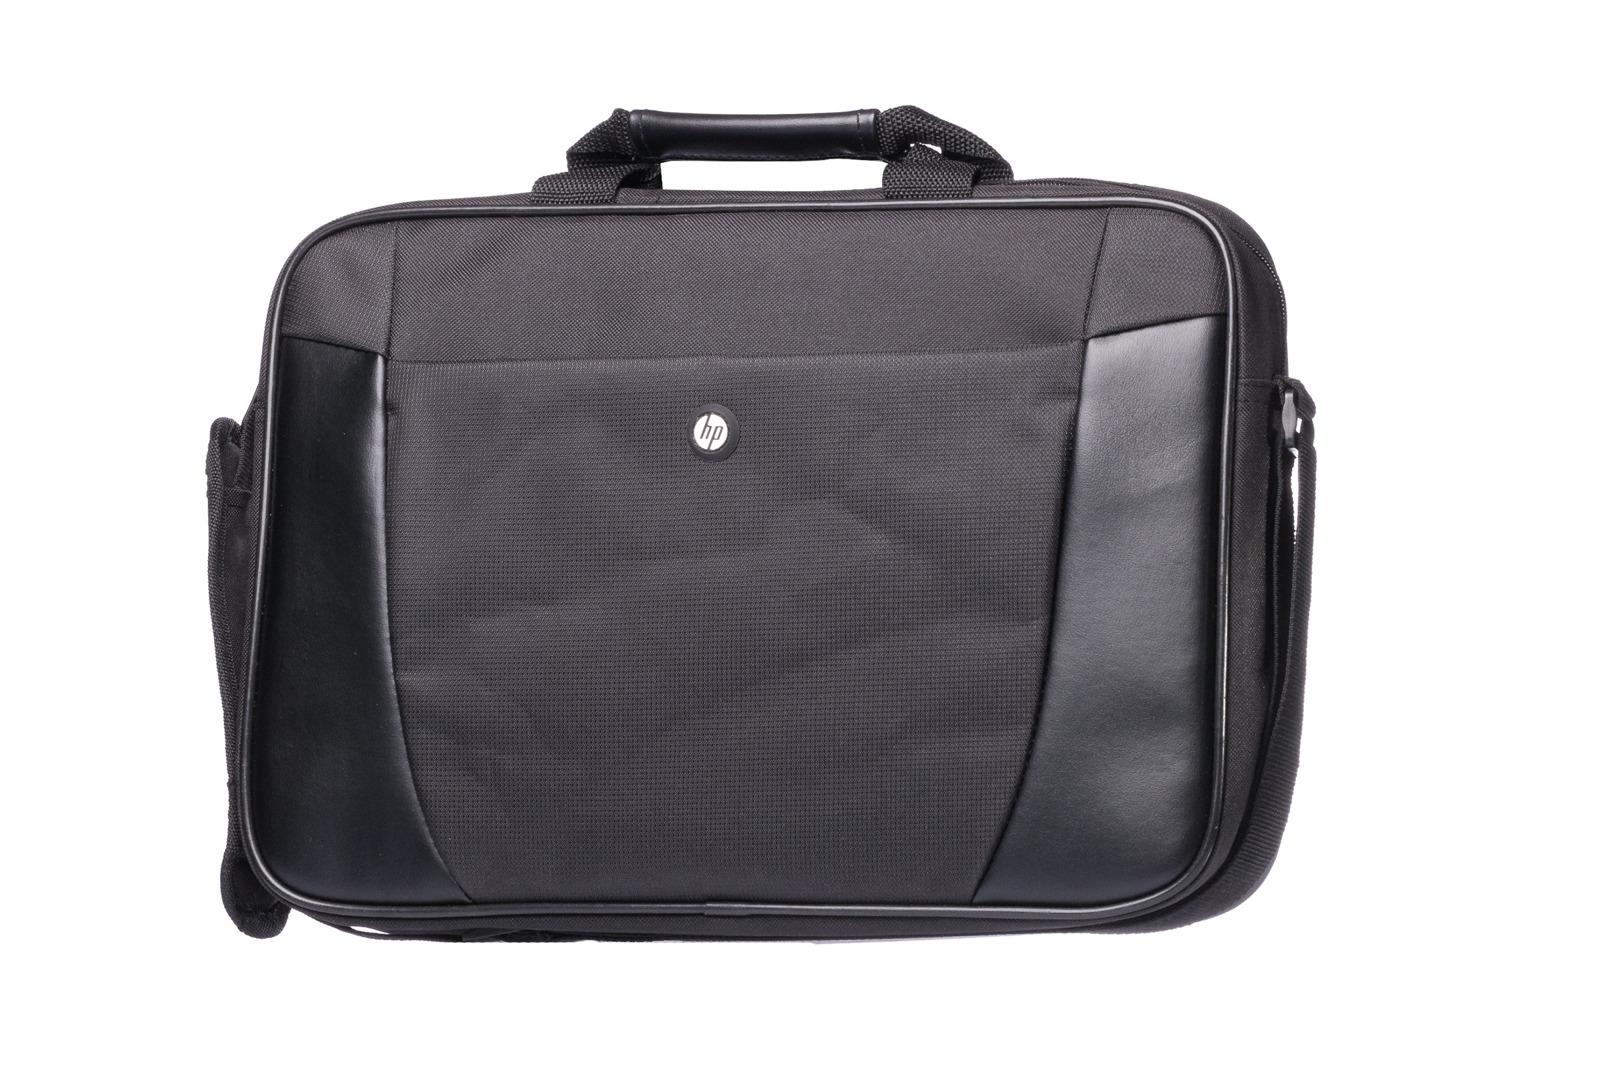 Laptoptasche HP Essential Top Load Case 15.6 679810-001